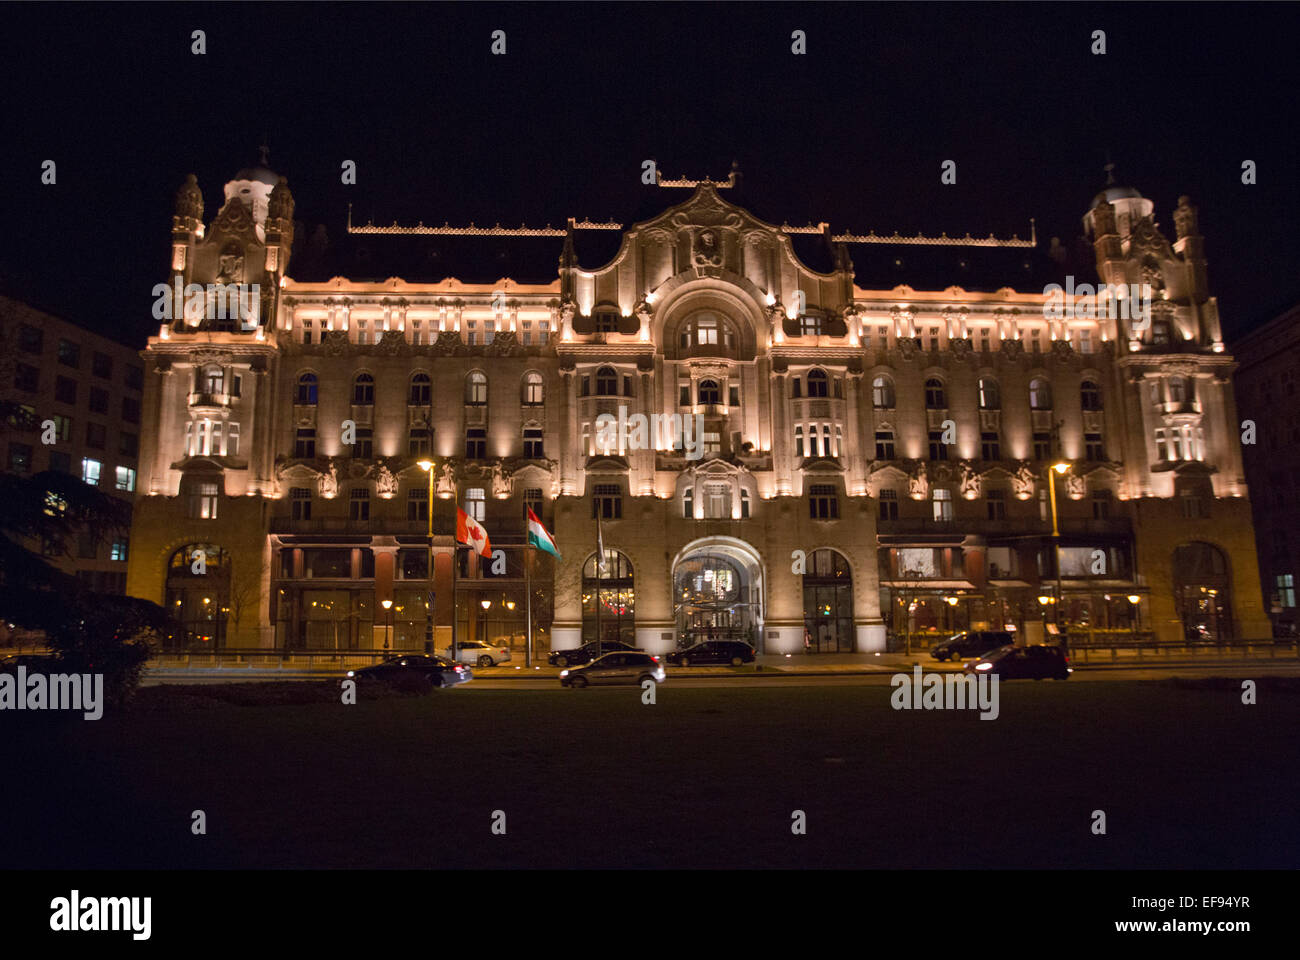 Four Seasons Hotel The Gresham Palace (Gresham-palota) art nouveau neo classical architecture by night in Budapest Stock Photo